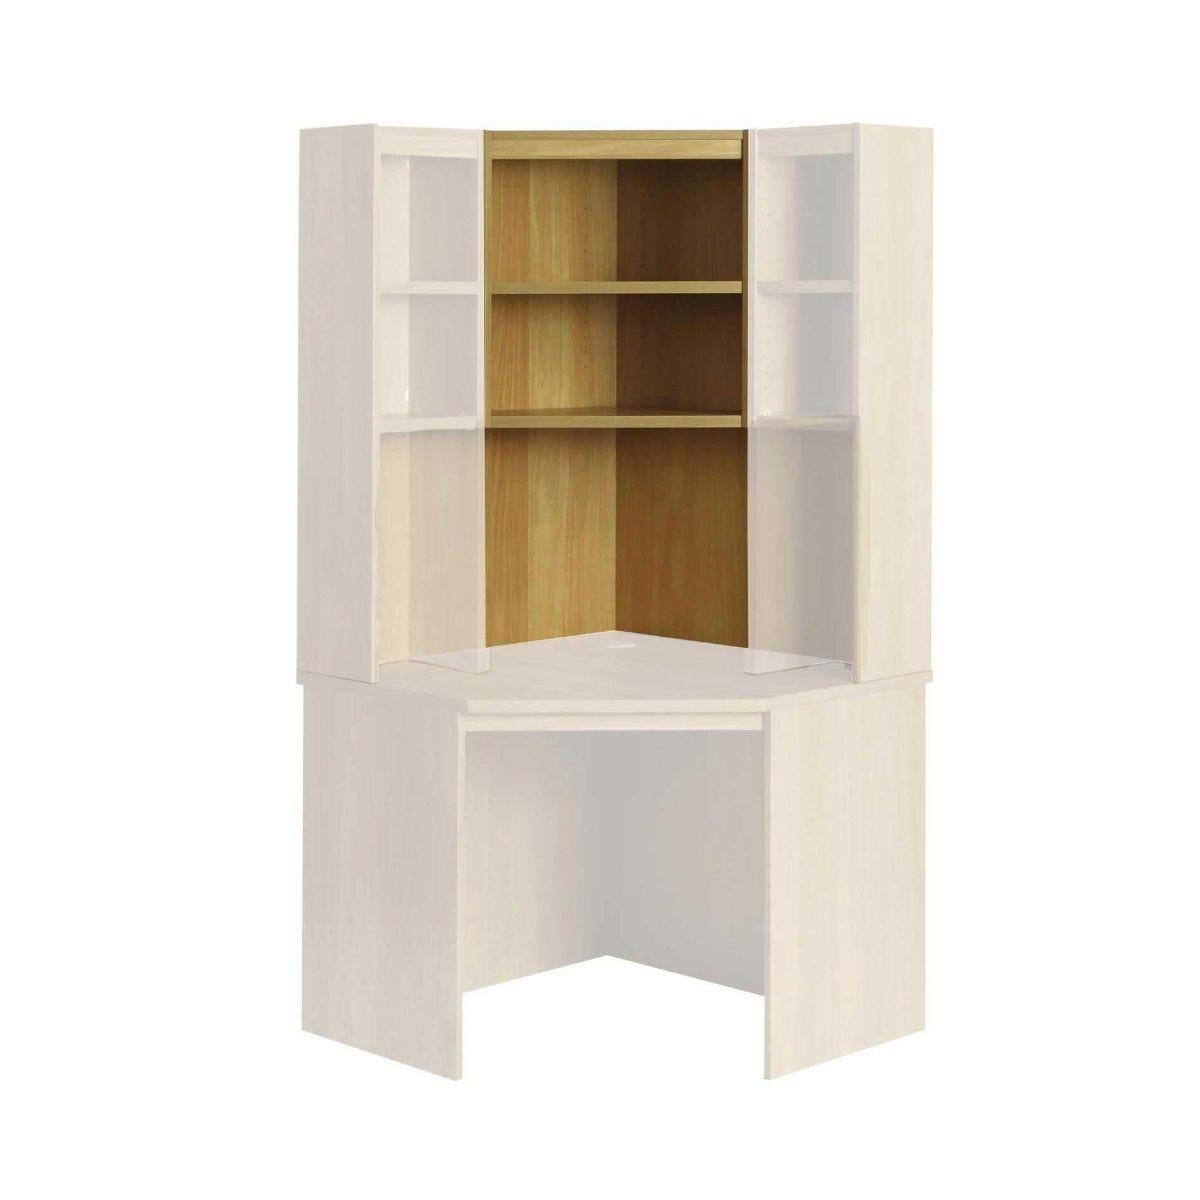 R White Overshelf Unit 2 Shelves OSE H1100xW642xD300mm, Walnut